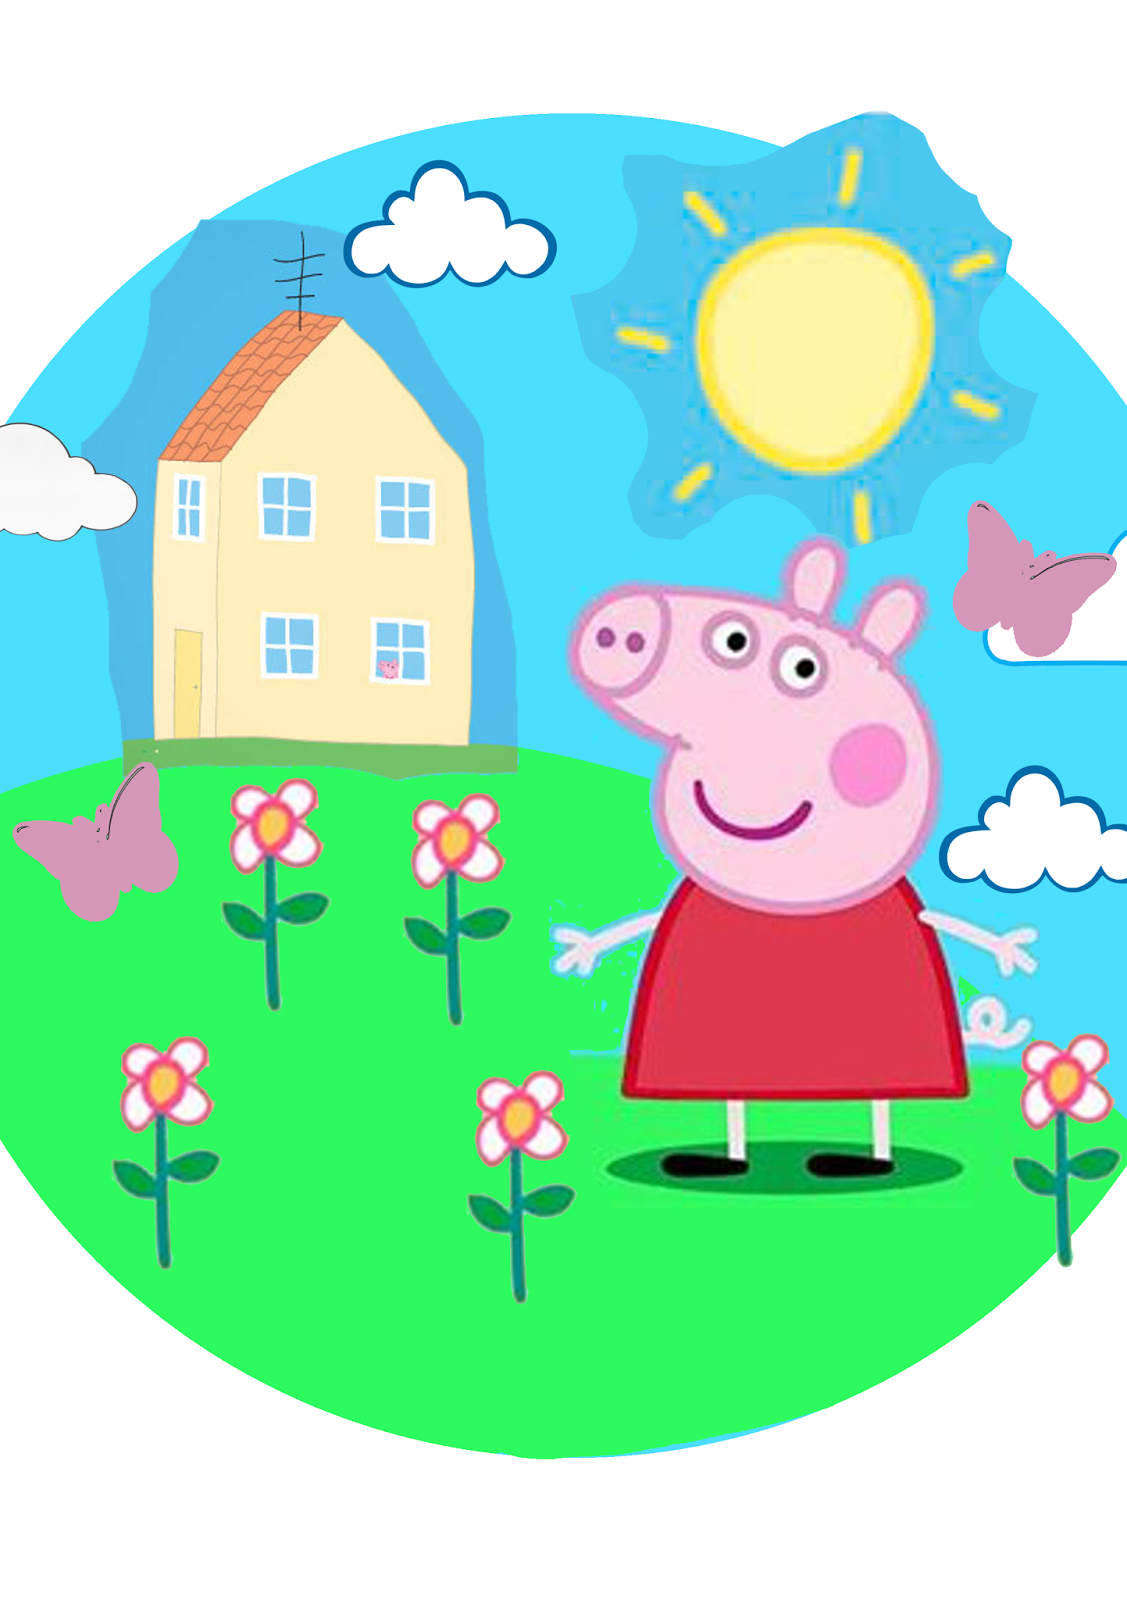 Peppa pig cake template free 28 images peppa pig for Peppa pig cake template free